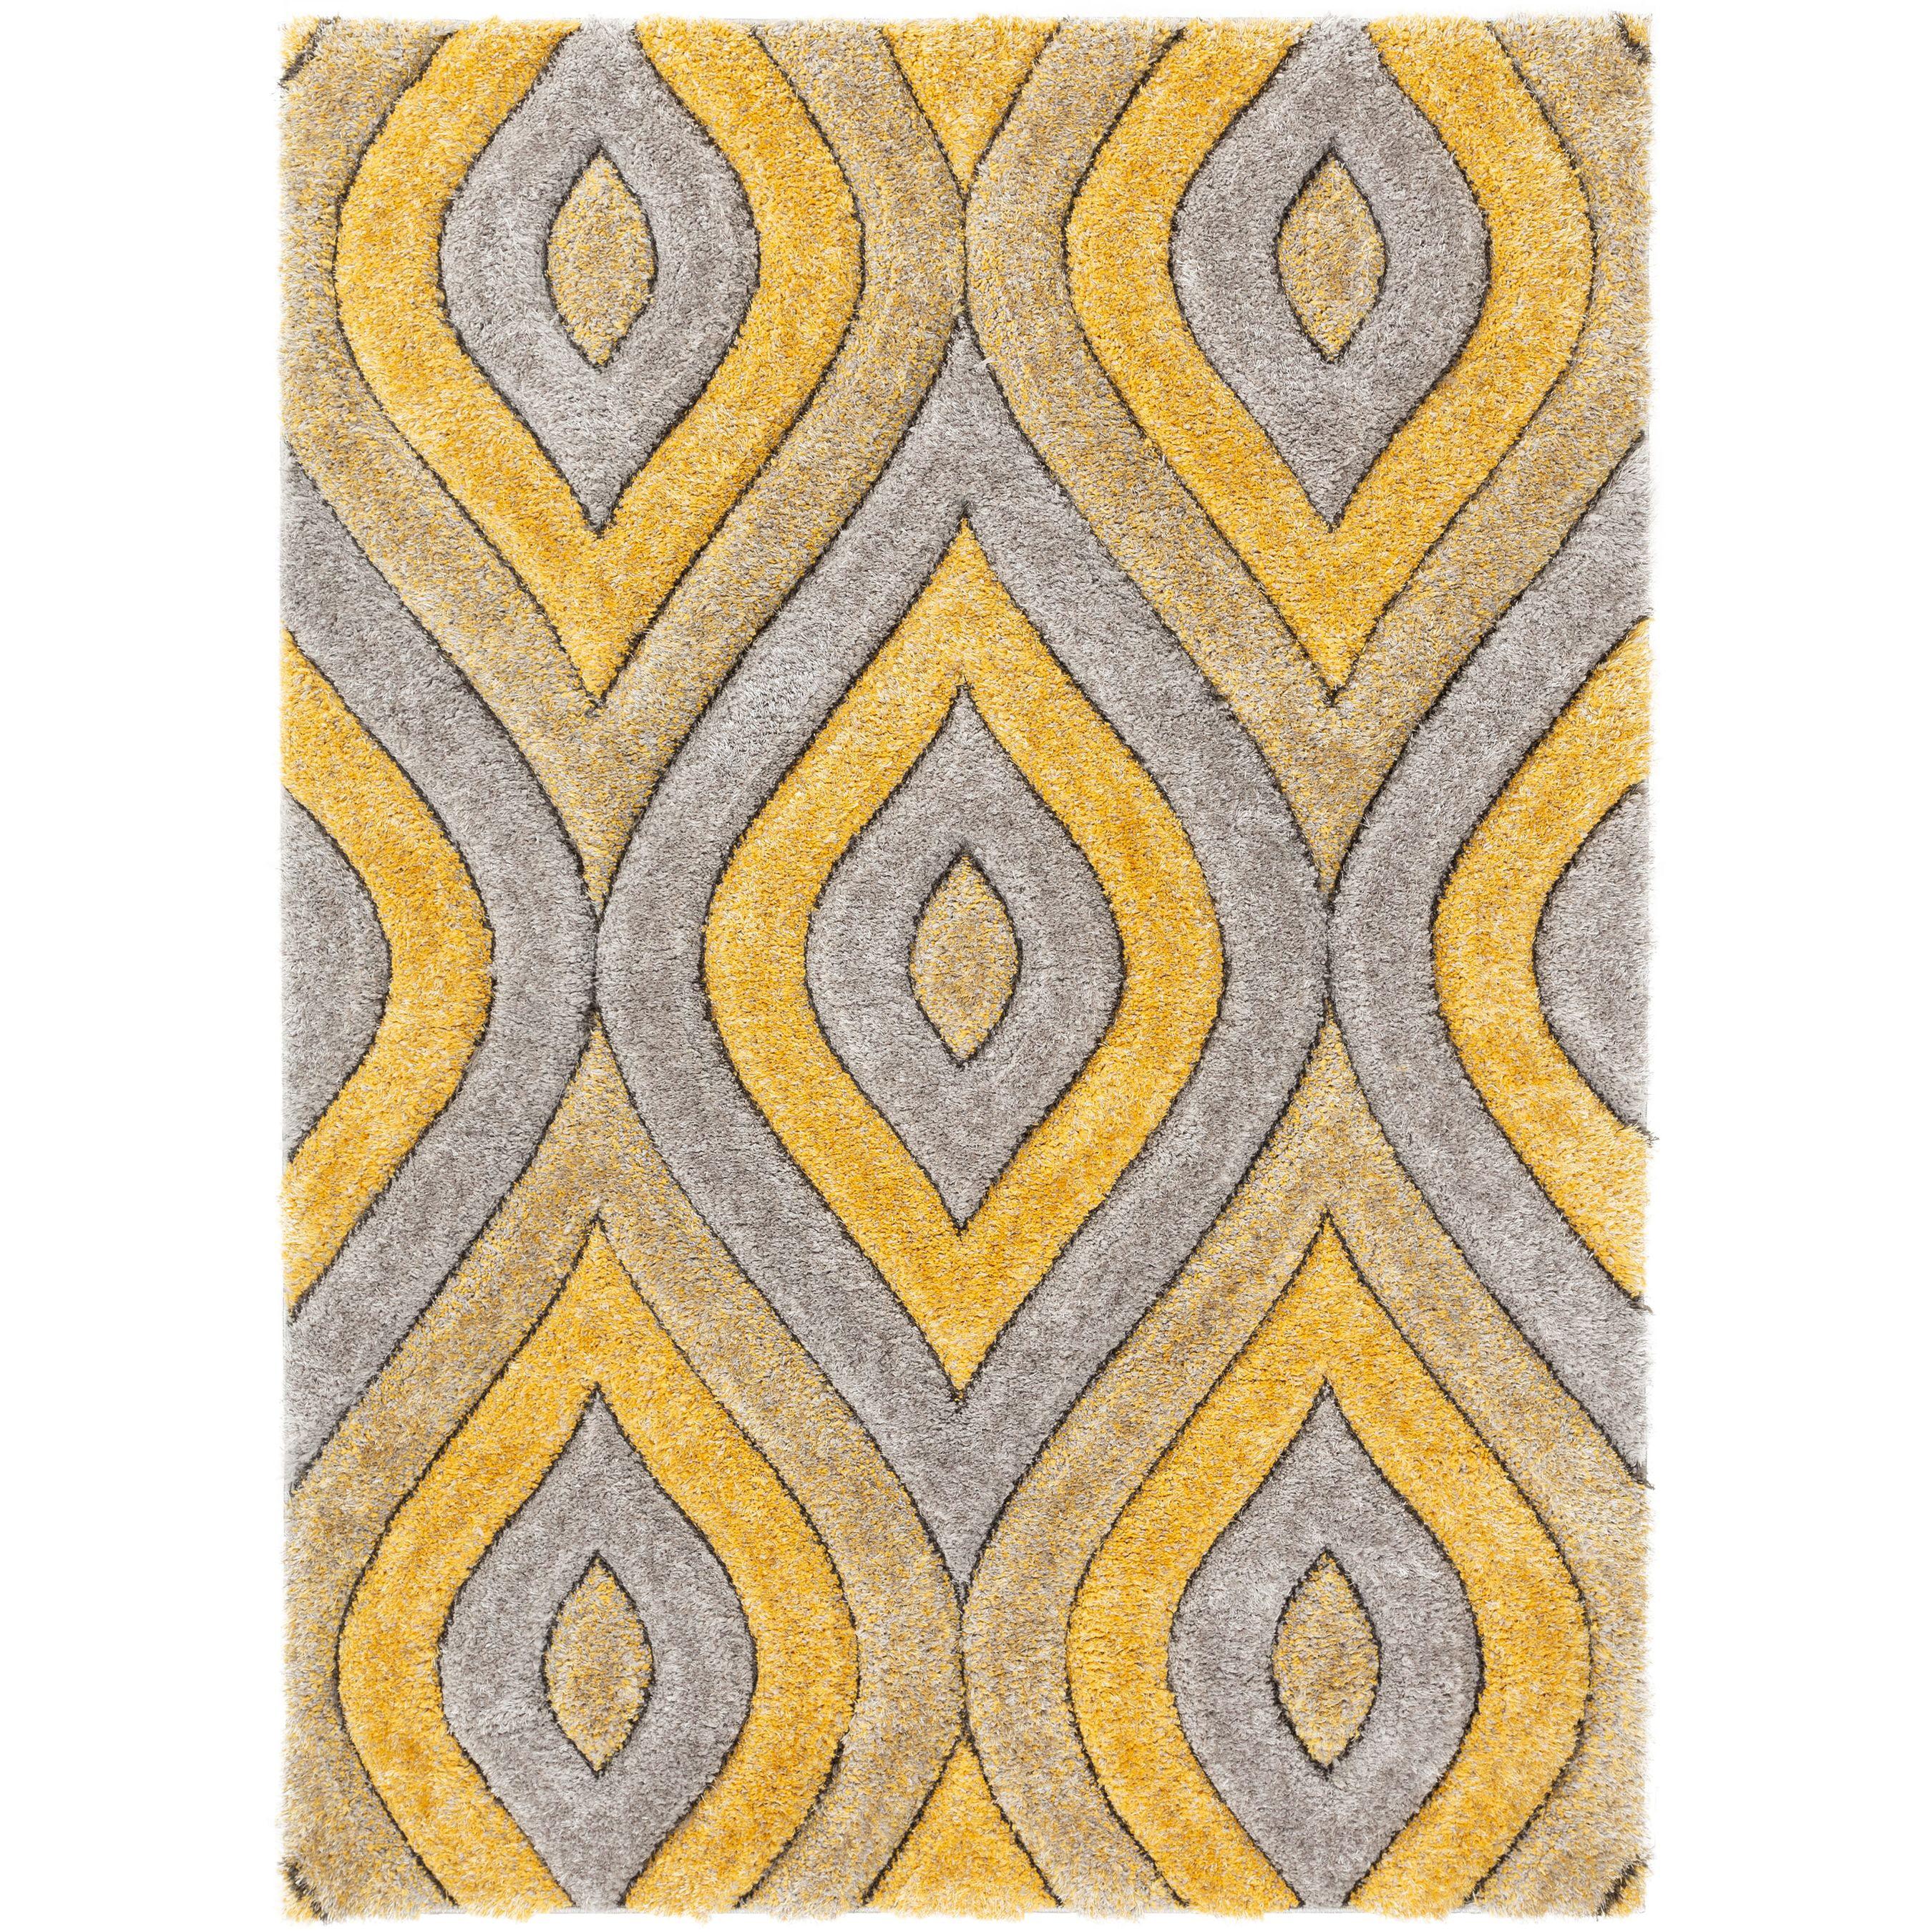 Picture of: Well Woven Moira Yellow Geometric Trellis Thick Soft Plush 3d Textured Shag Area Rug 8×10 7 10 X 9 10 Walmart Com Walmart Com